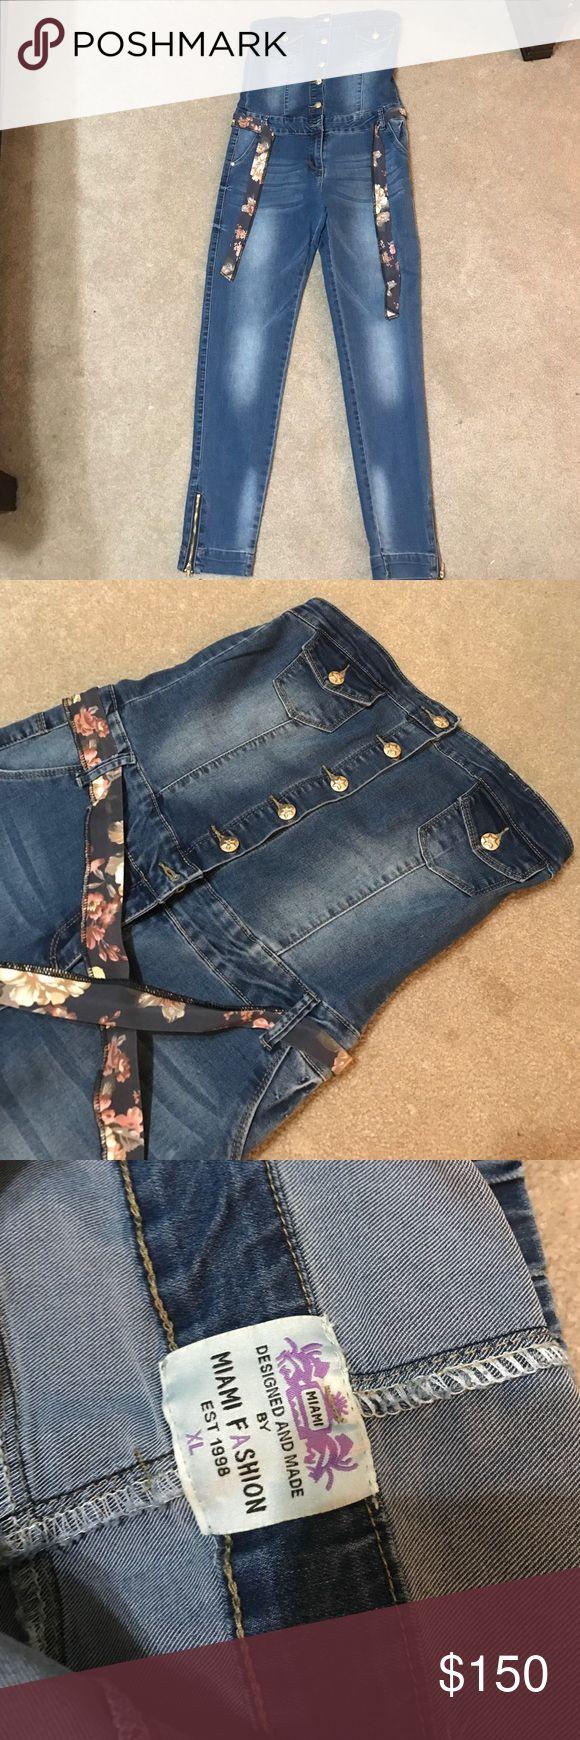 Jeans jumpsuit Miami fashions Never wore Miami fashion jeans jumpsuit size XL but it fit who wear L size miami fashions Pants Jumpsuits & Rompers